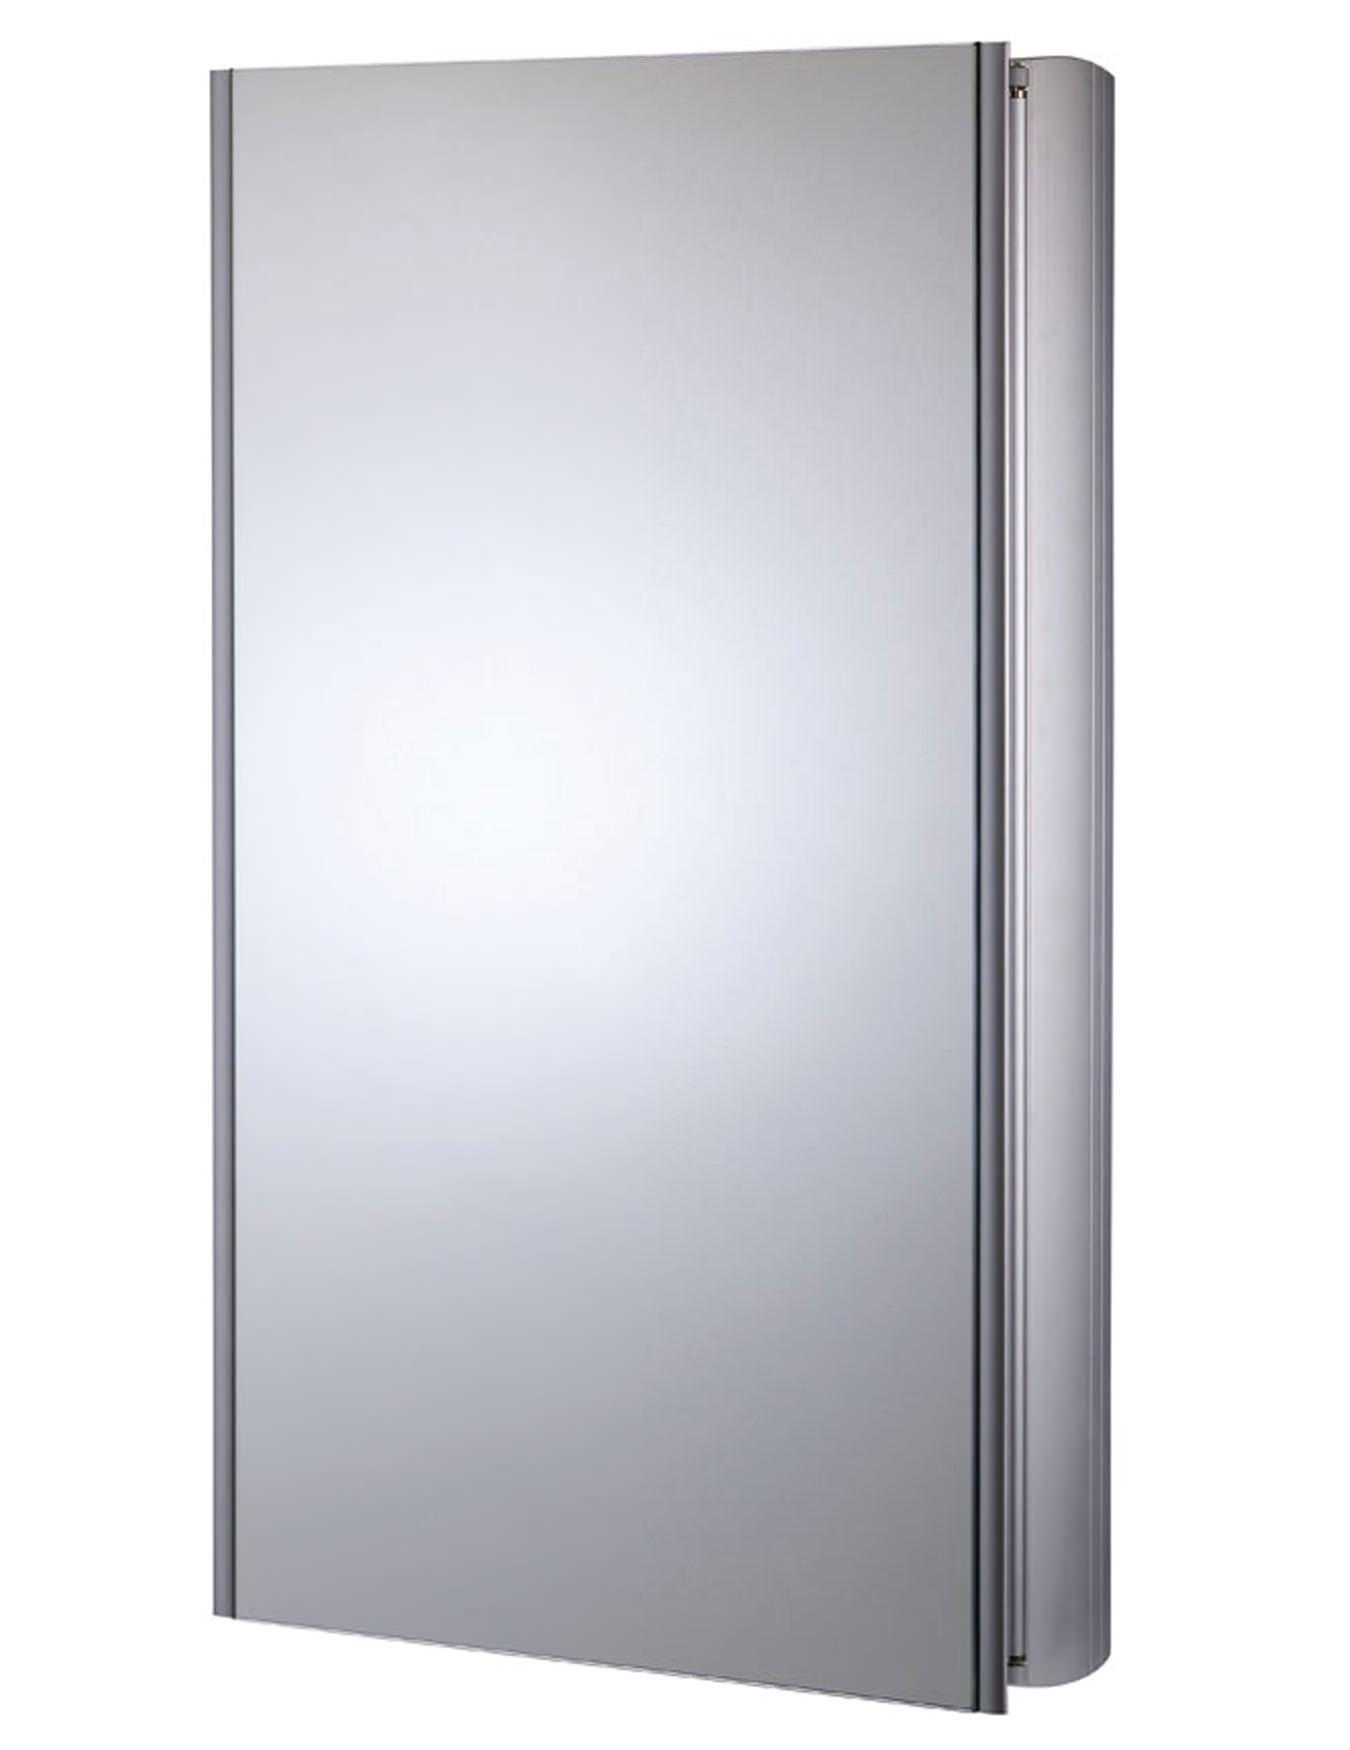 bathroom cabinets mirrored cabinets ascension limit slimline bathroom